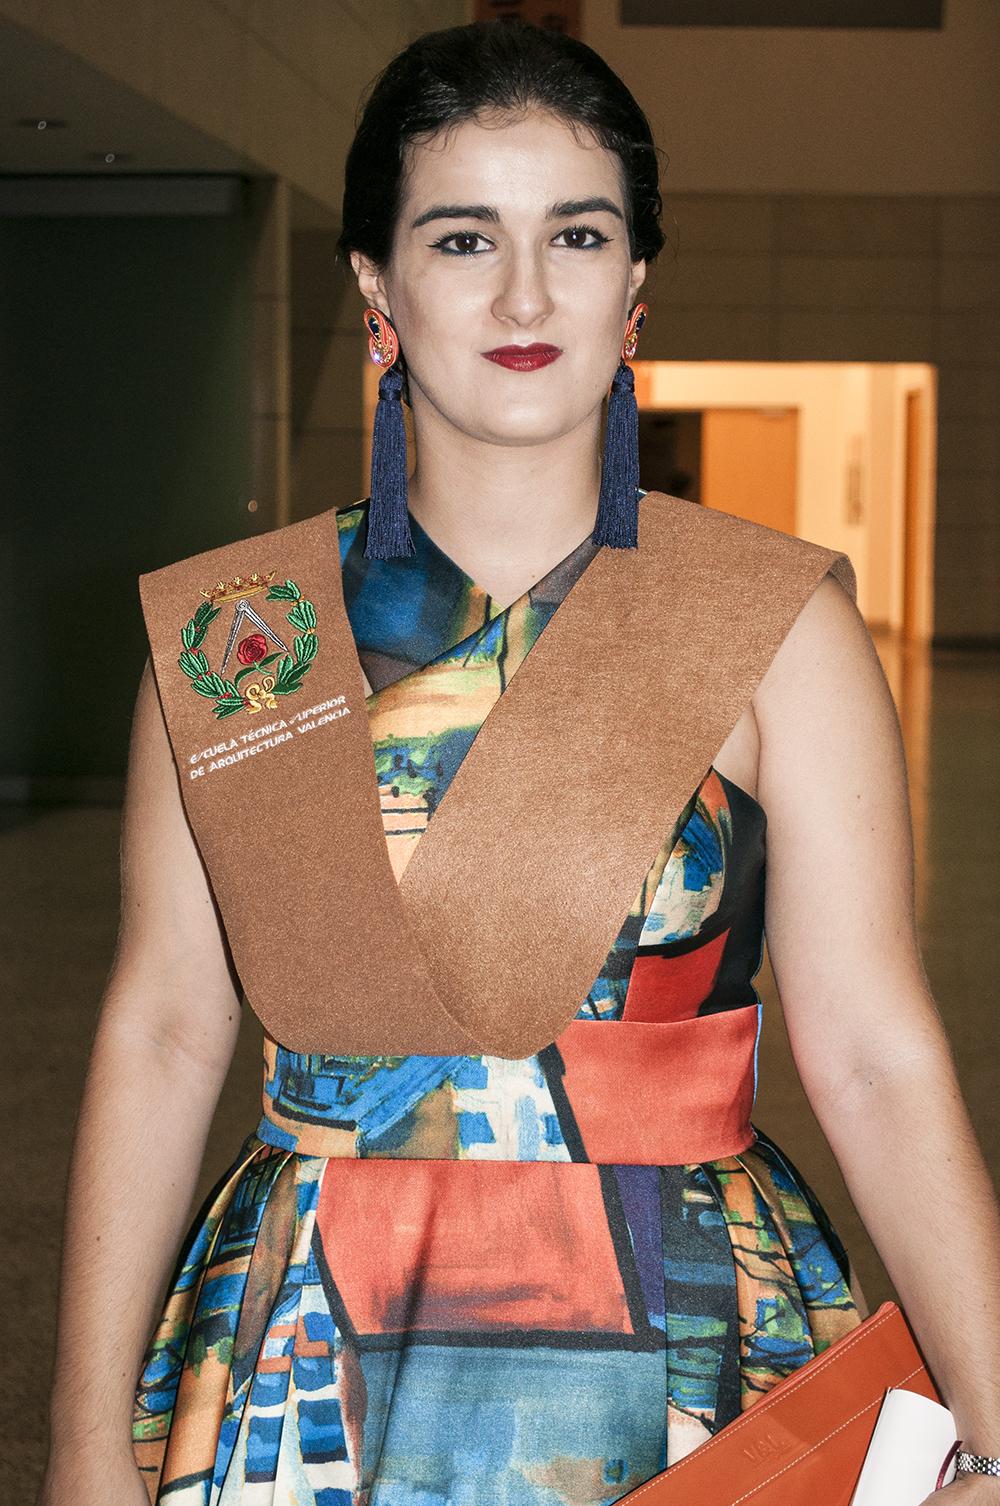 fashion blogger spain somethingfashion valencia graduation college ceremony outfit dress architecture7